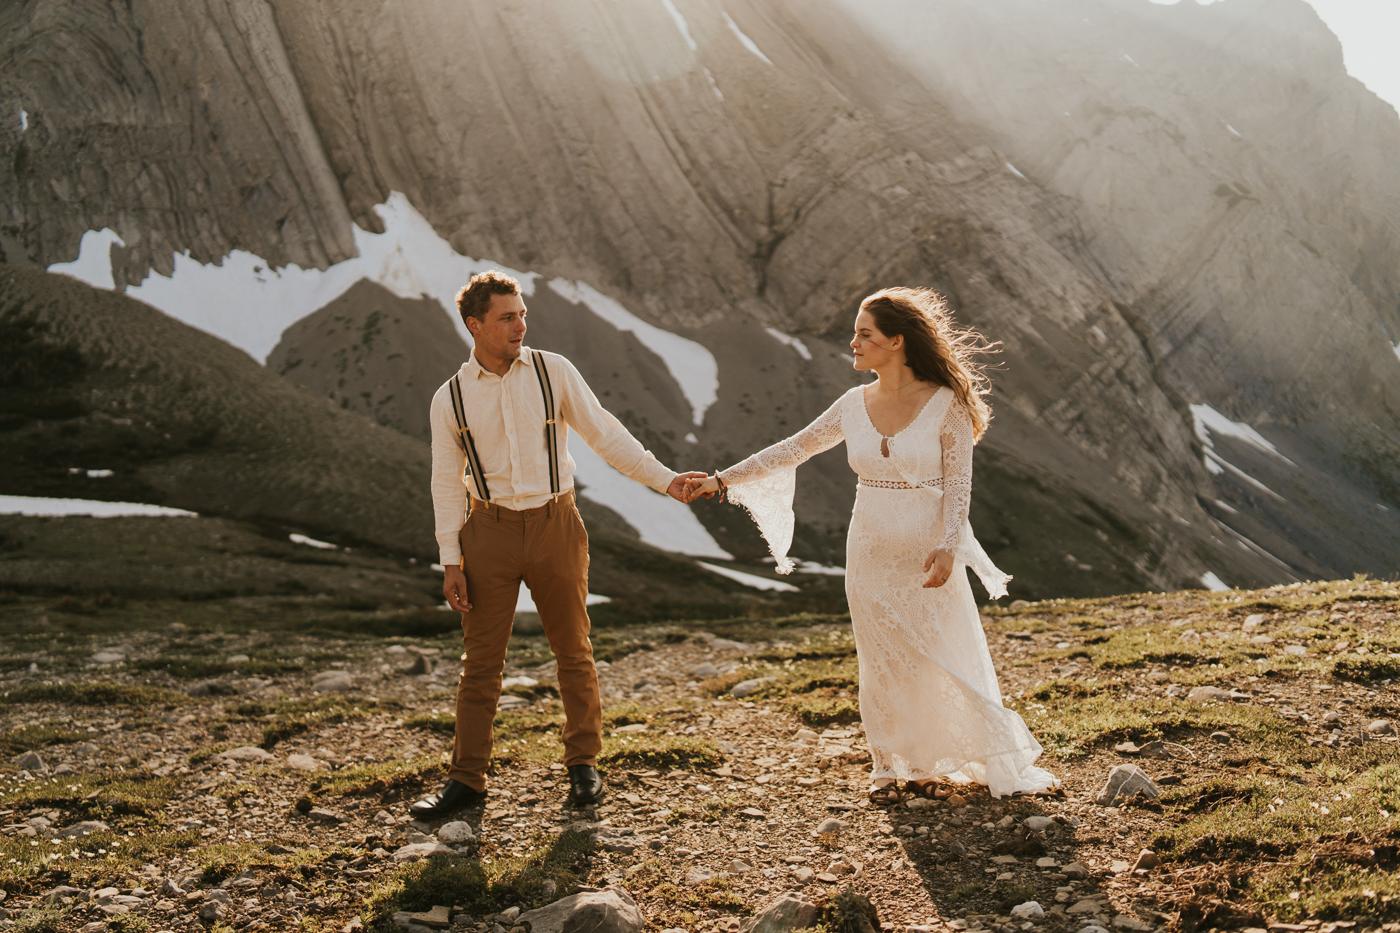 tyraephotography_photographer_wedding_elopement_engagement_photography-08295.jpg